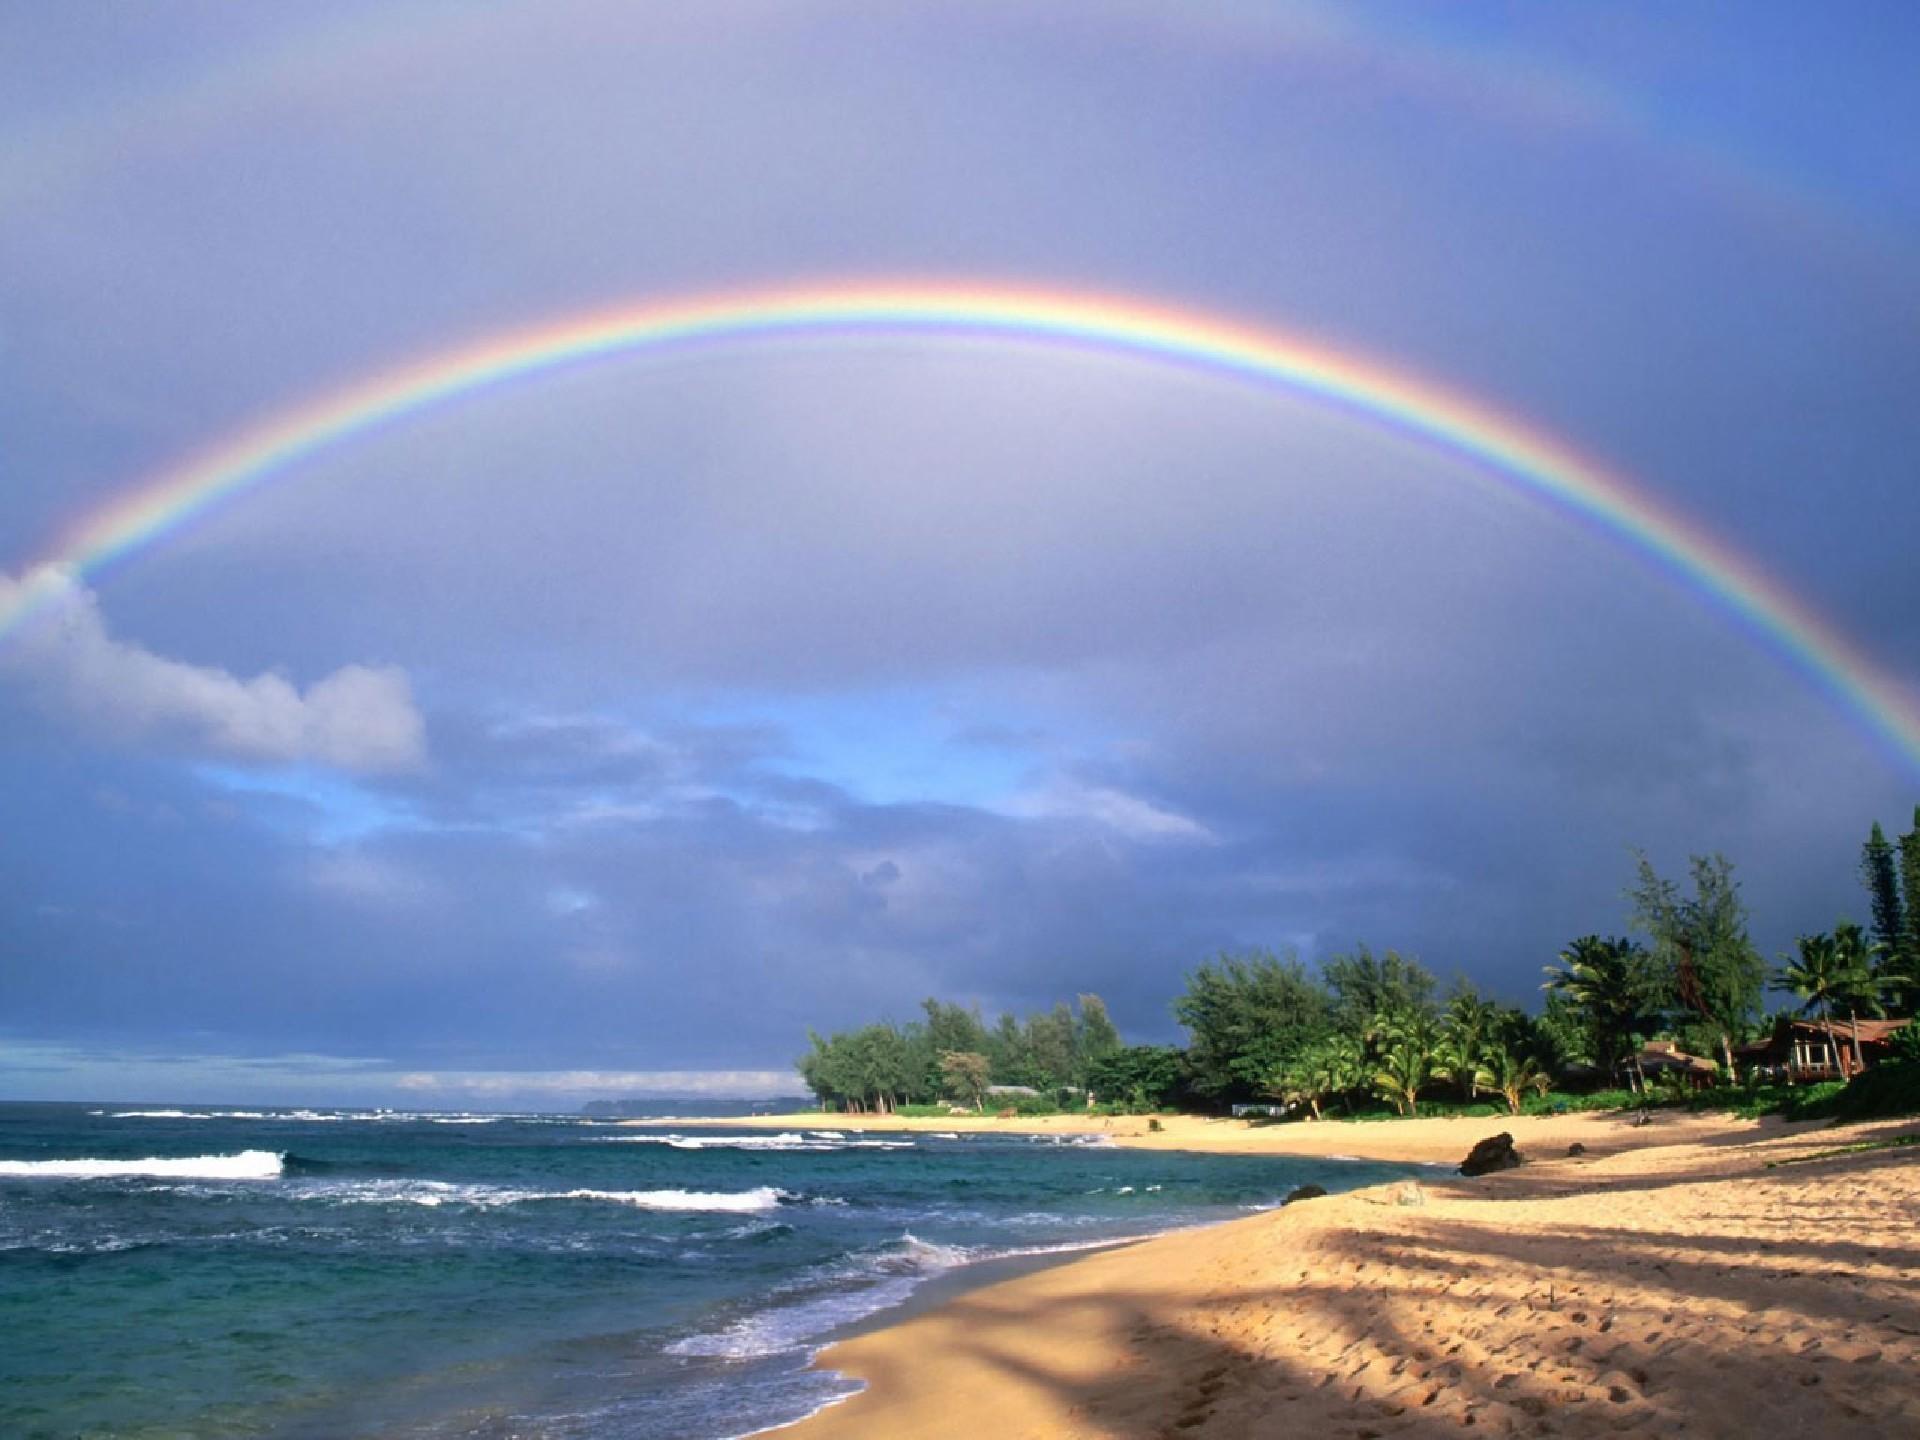 Радуга на море над пляжем растянулась